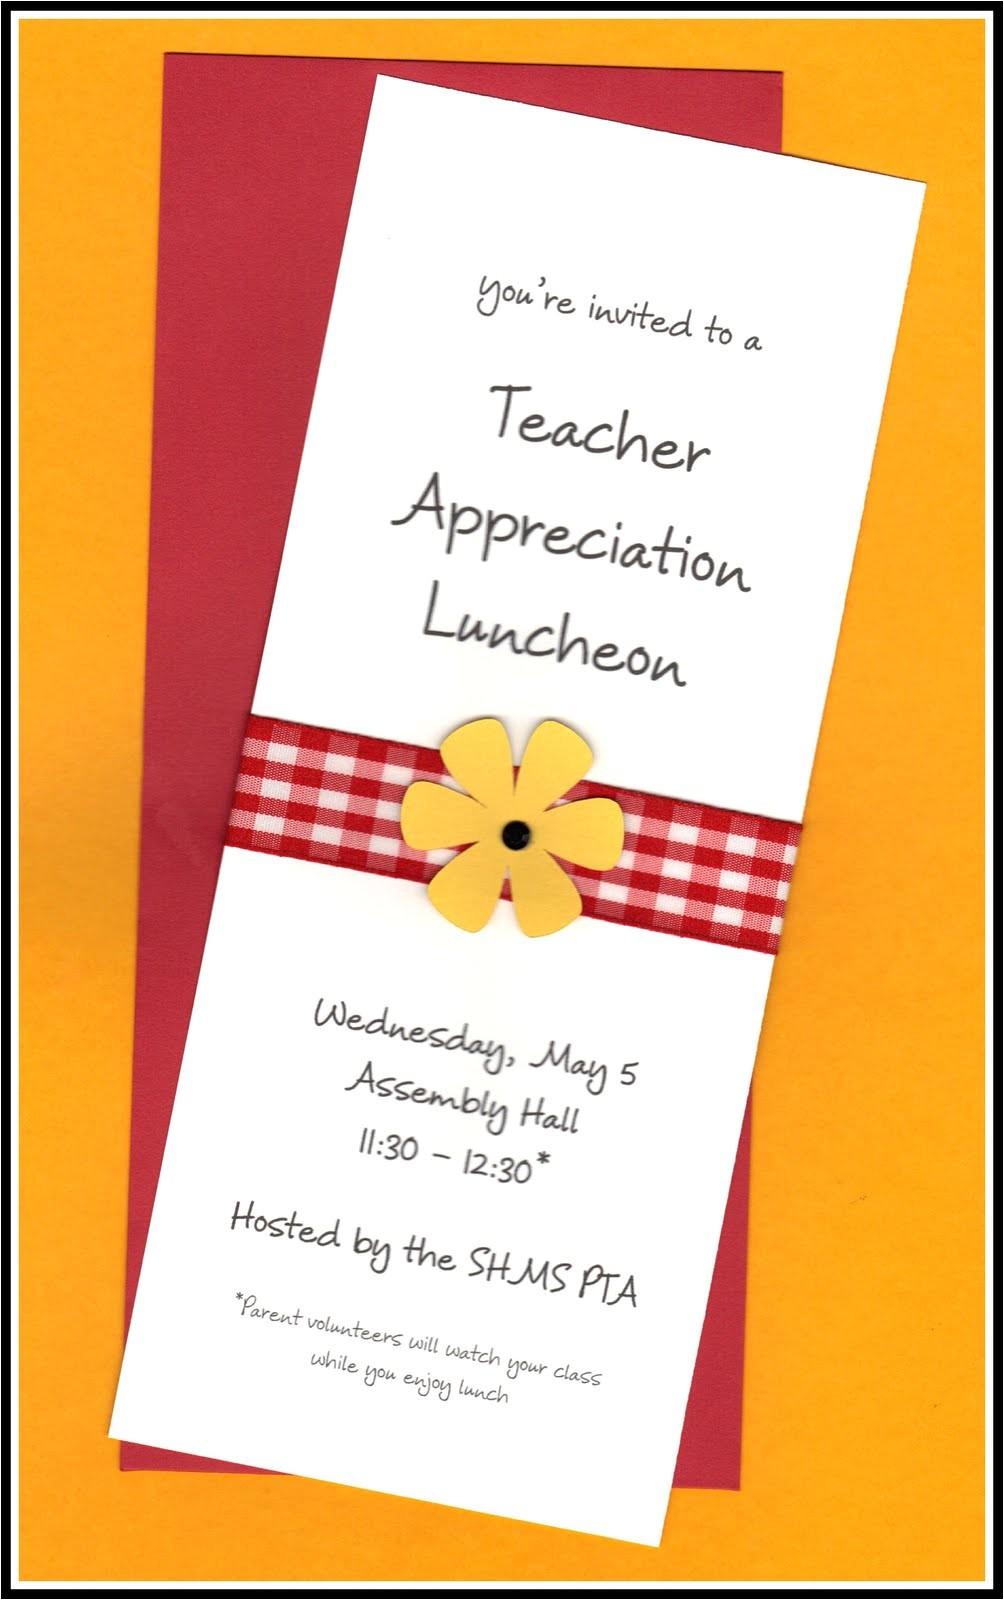 staff appreciation luncheon invitation wording